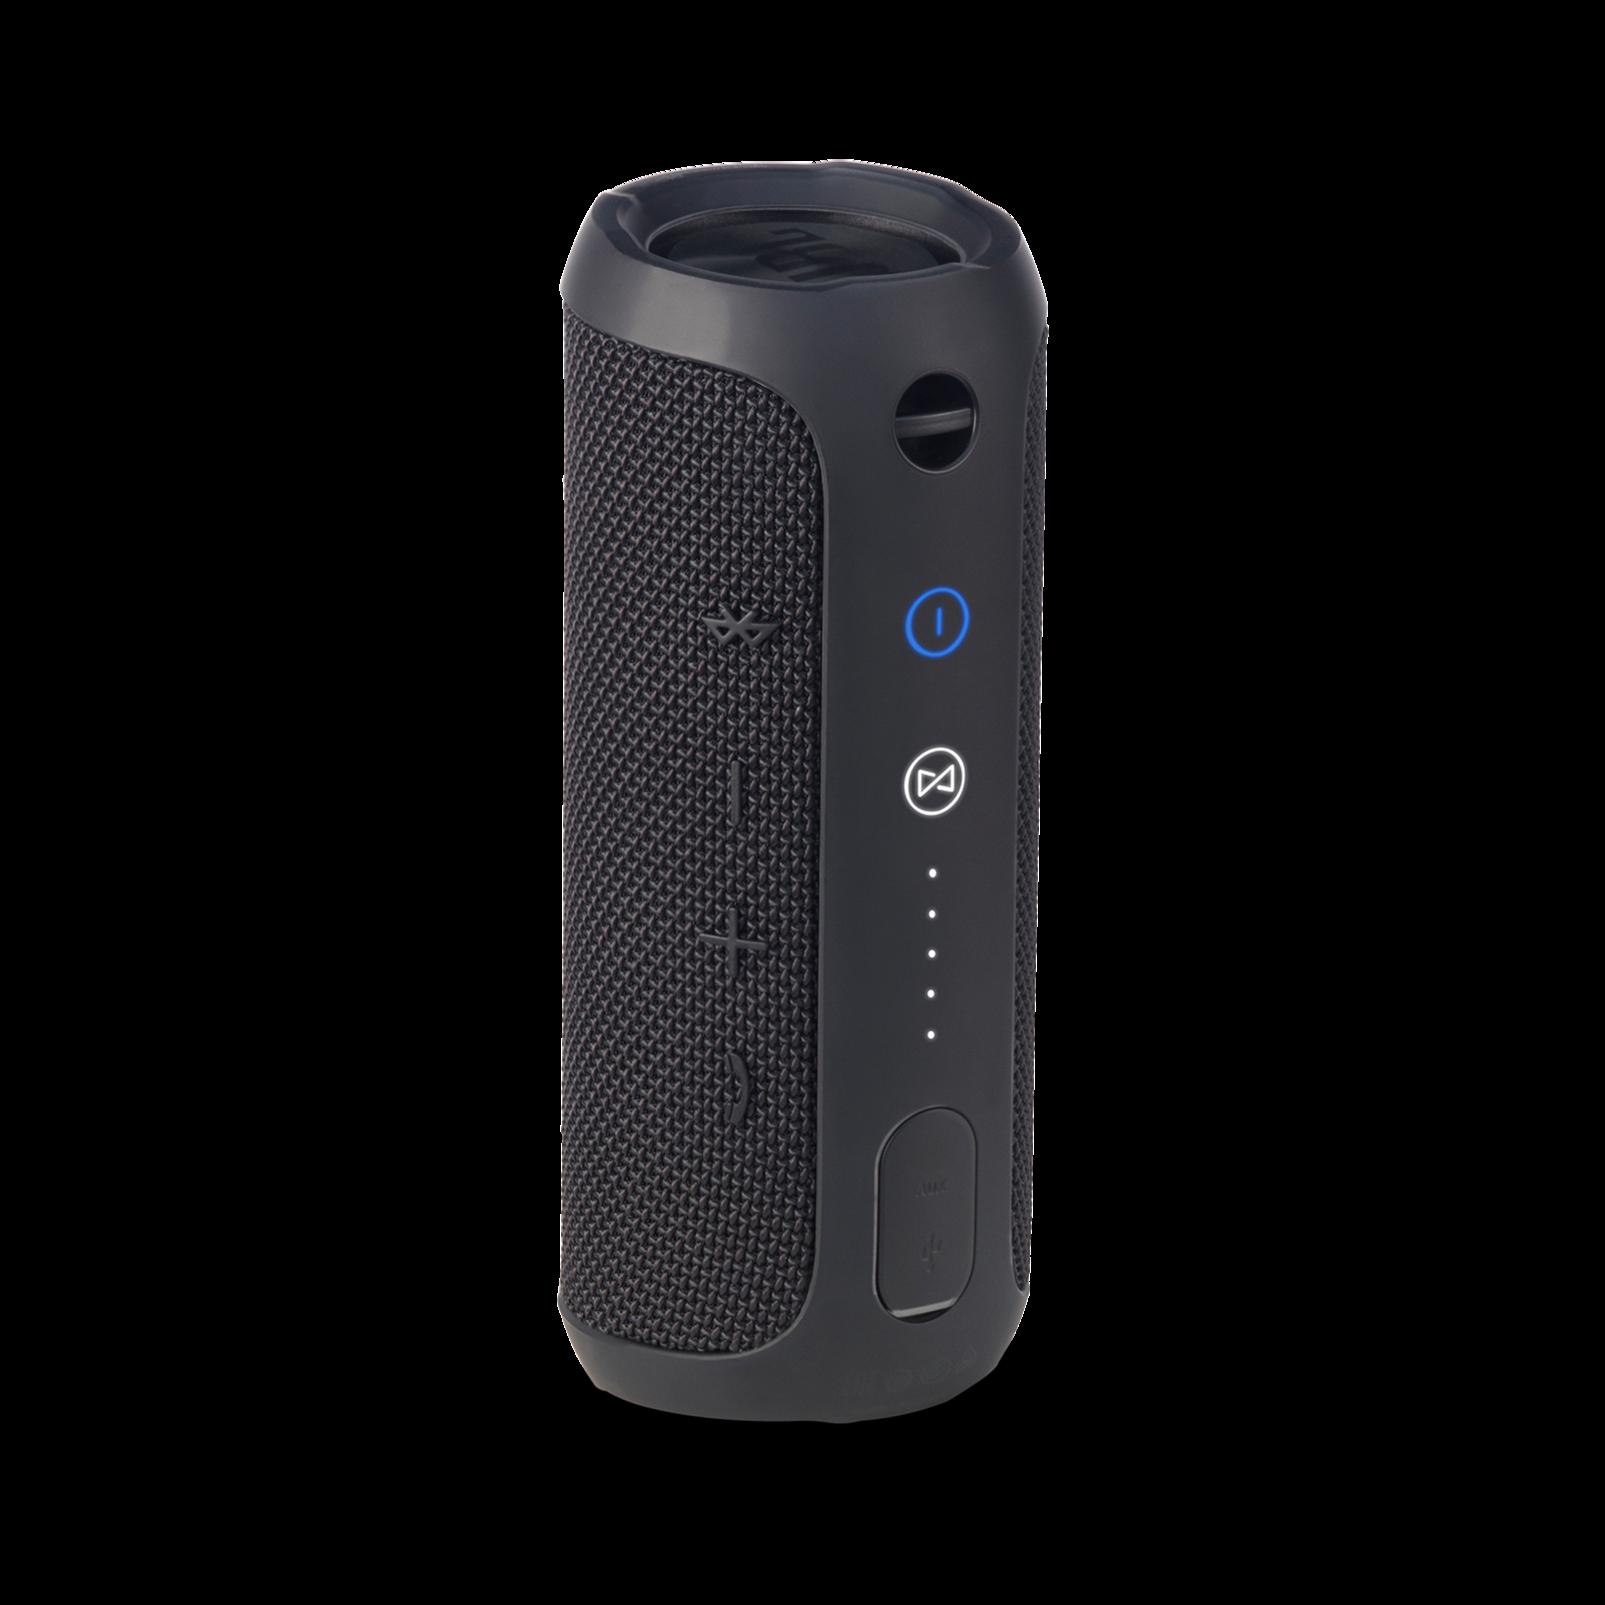 JBL Flip 3 - Black - Splashproof portable Bluetooth speaker with powerful sound and speakerphone technology - Back